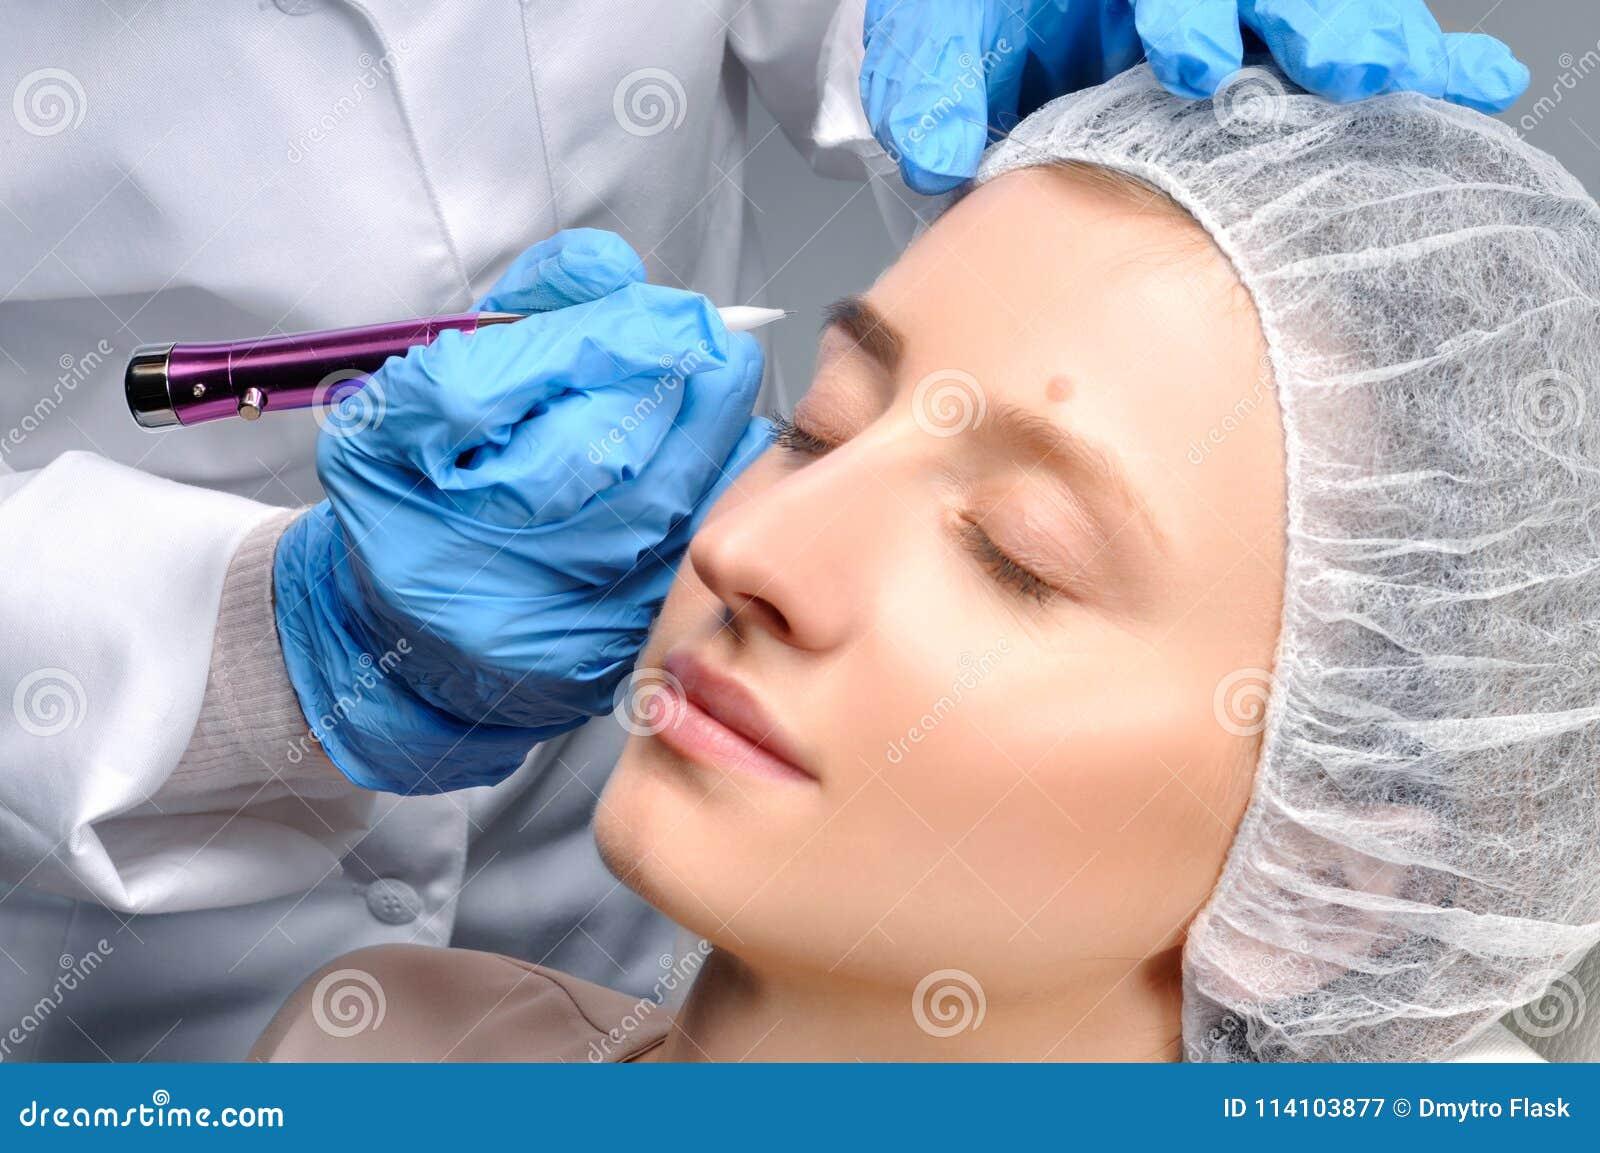 Microblading cosmetologist makeup που κάνει μόνιμο Ελκυστική γυναίκα που παίρνει τα του προσώπου φρύδια προσοχής και δερματοστιξι